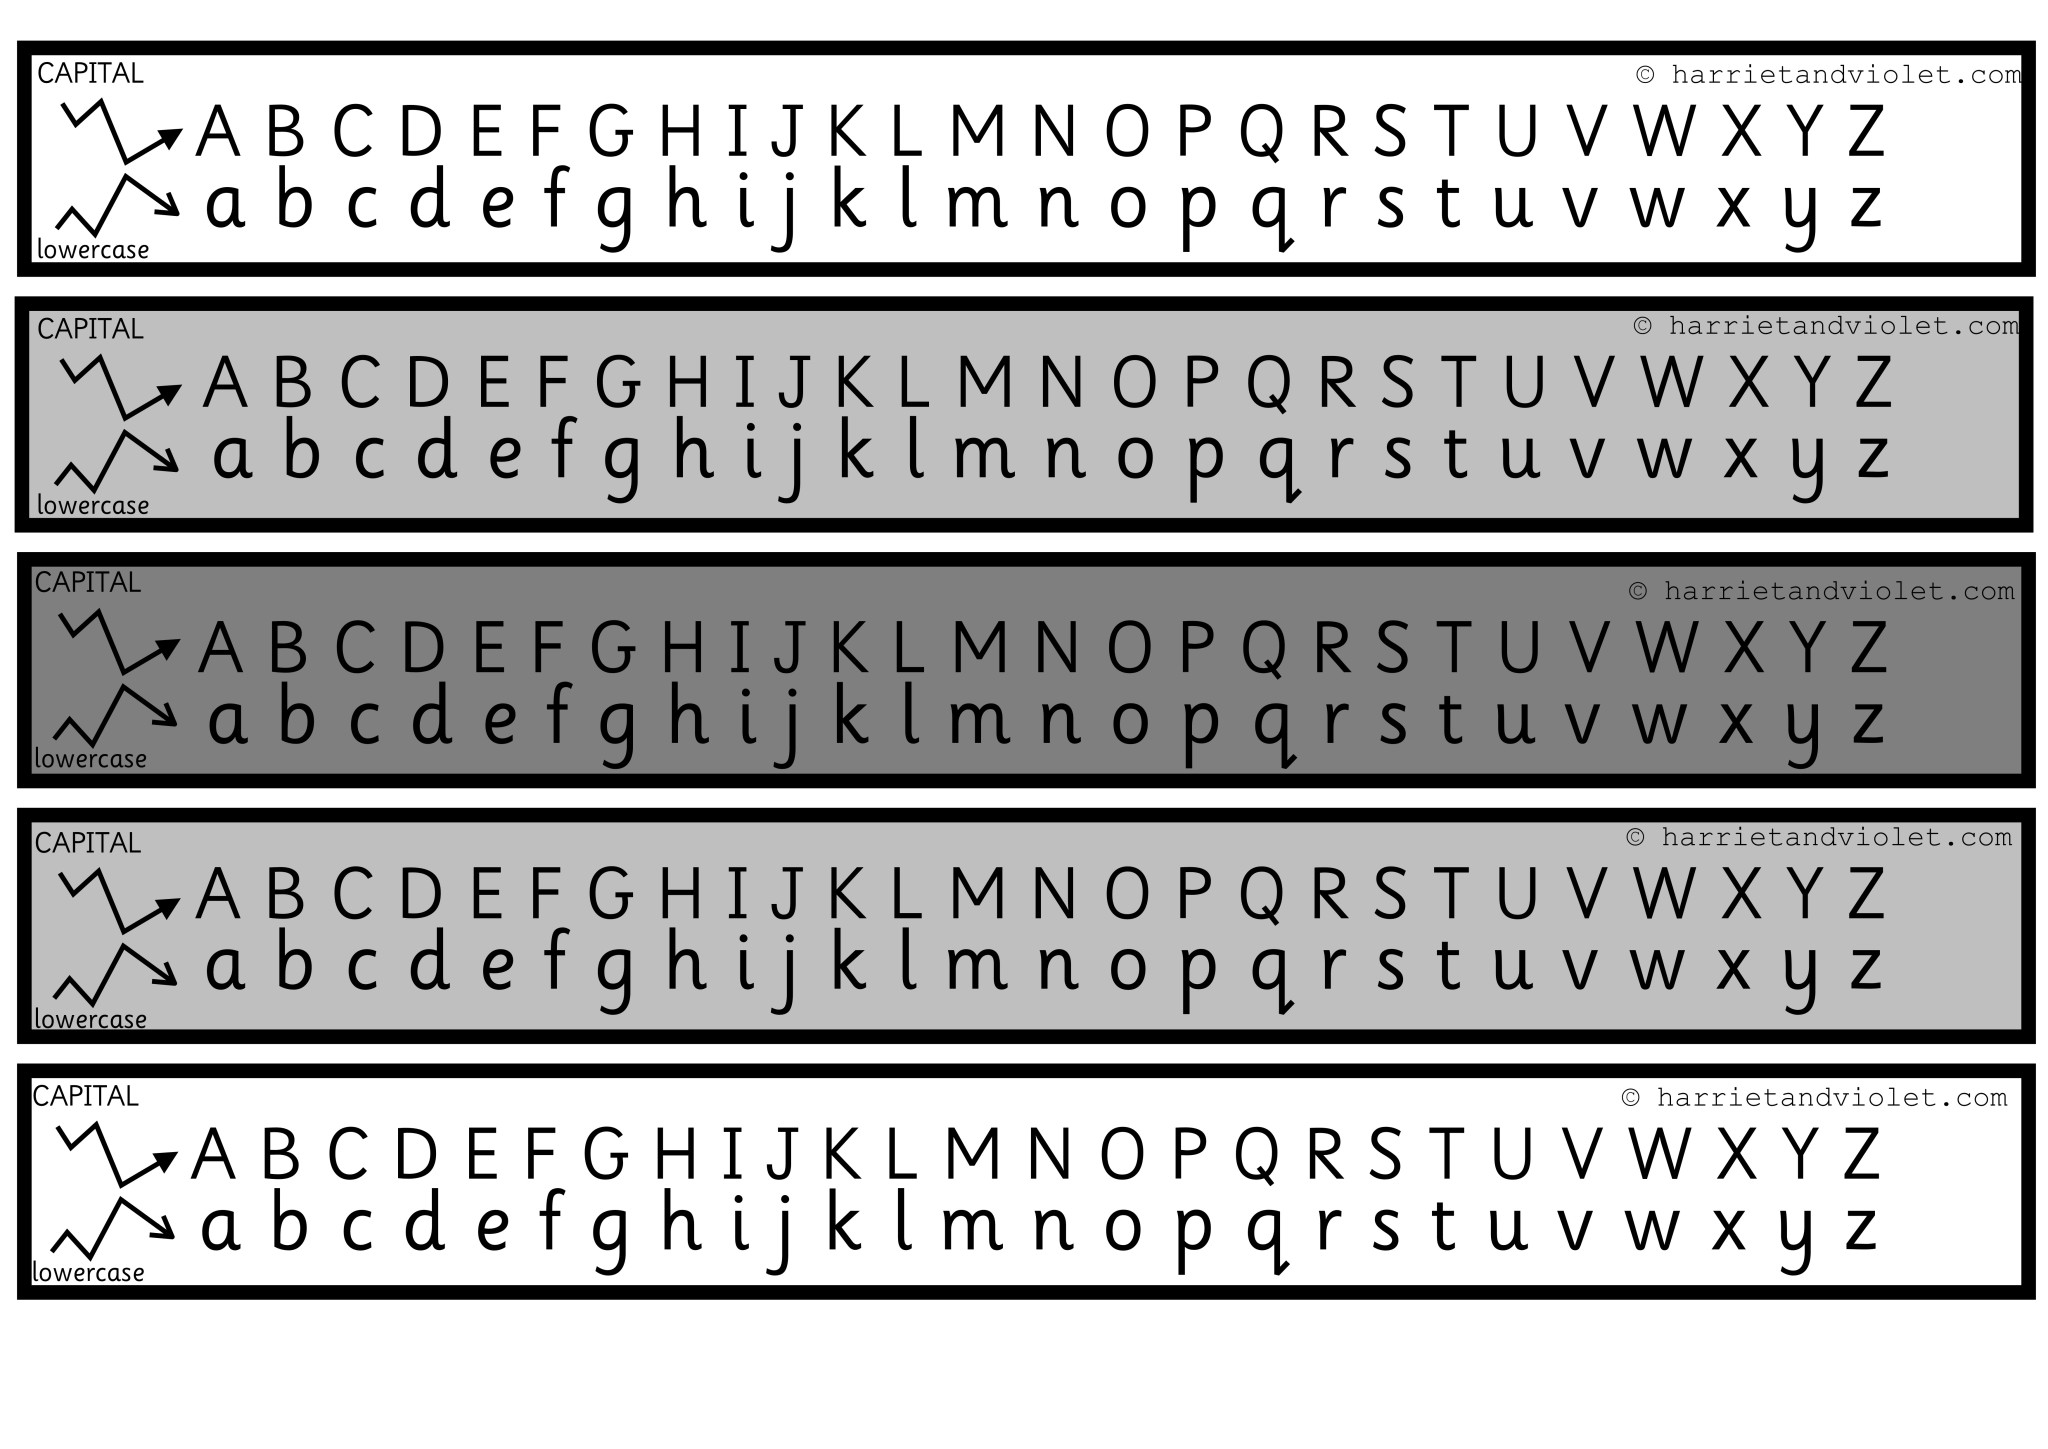 Images of Sumerian Alphabet Lower Case - #rock-cafe